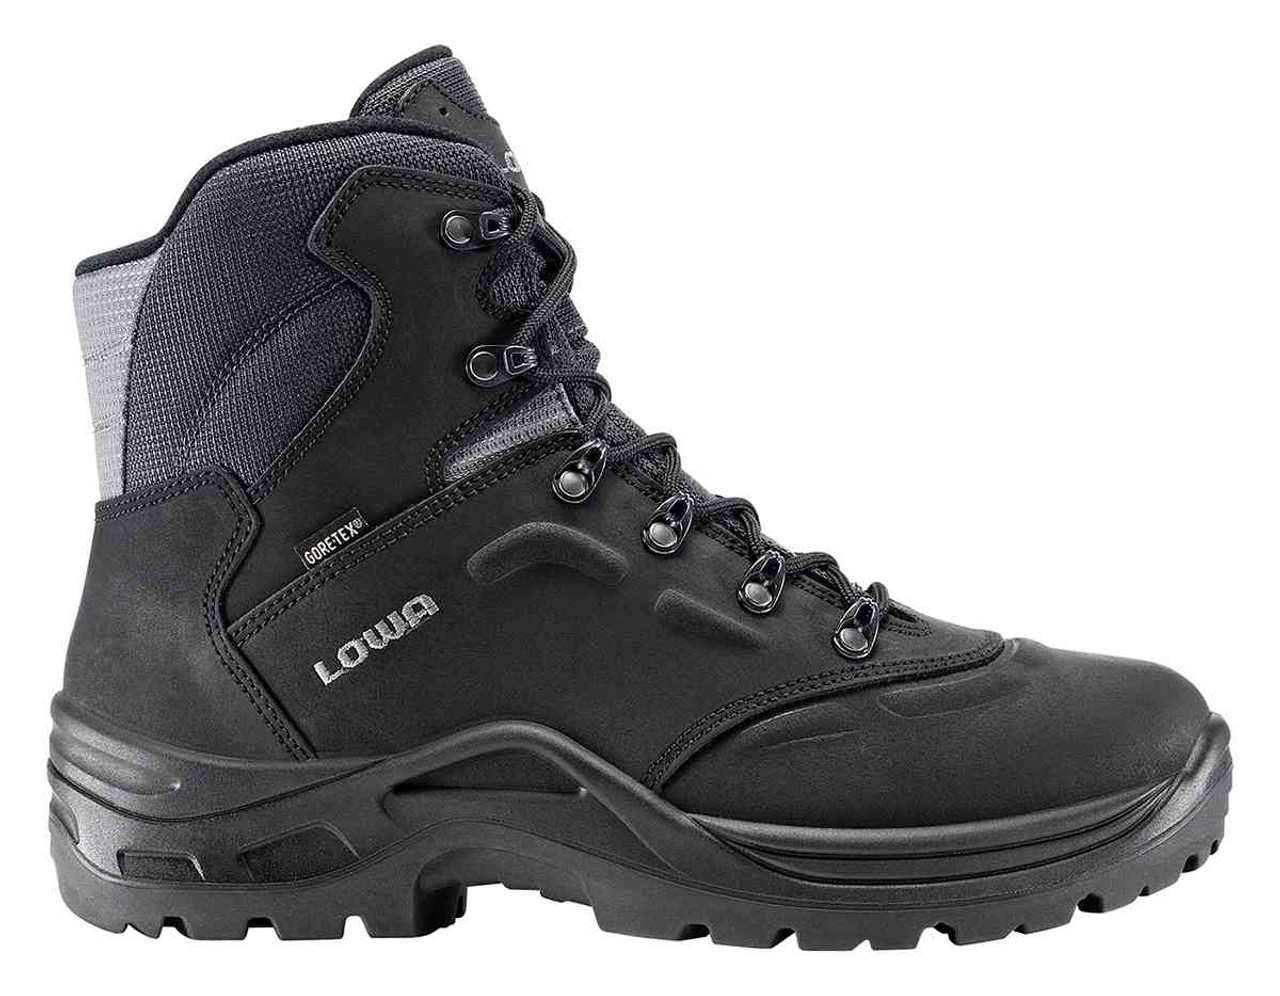 87421f487c0 Women's Lowa Nabucco GTX Mid Winter Hiking Boot